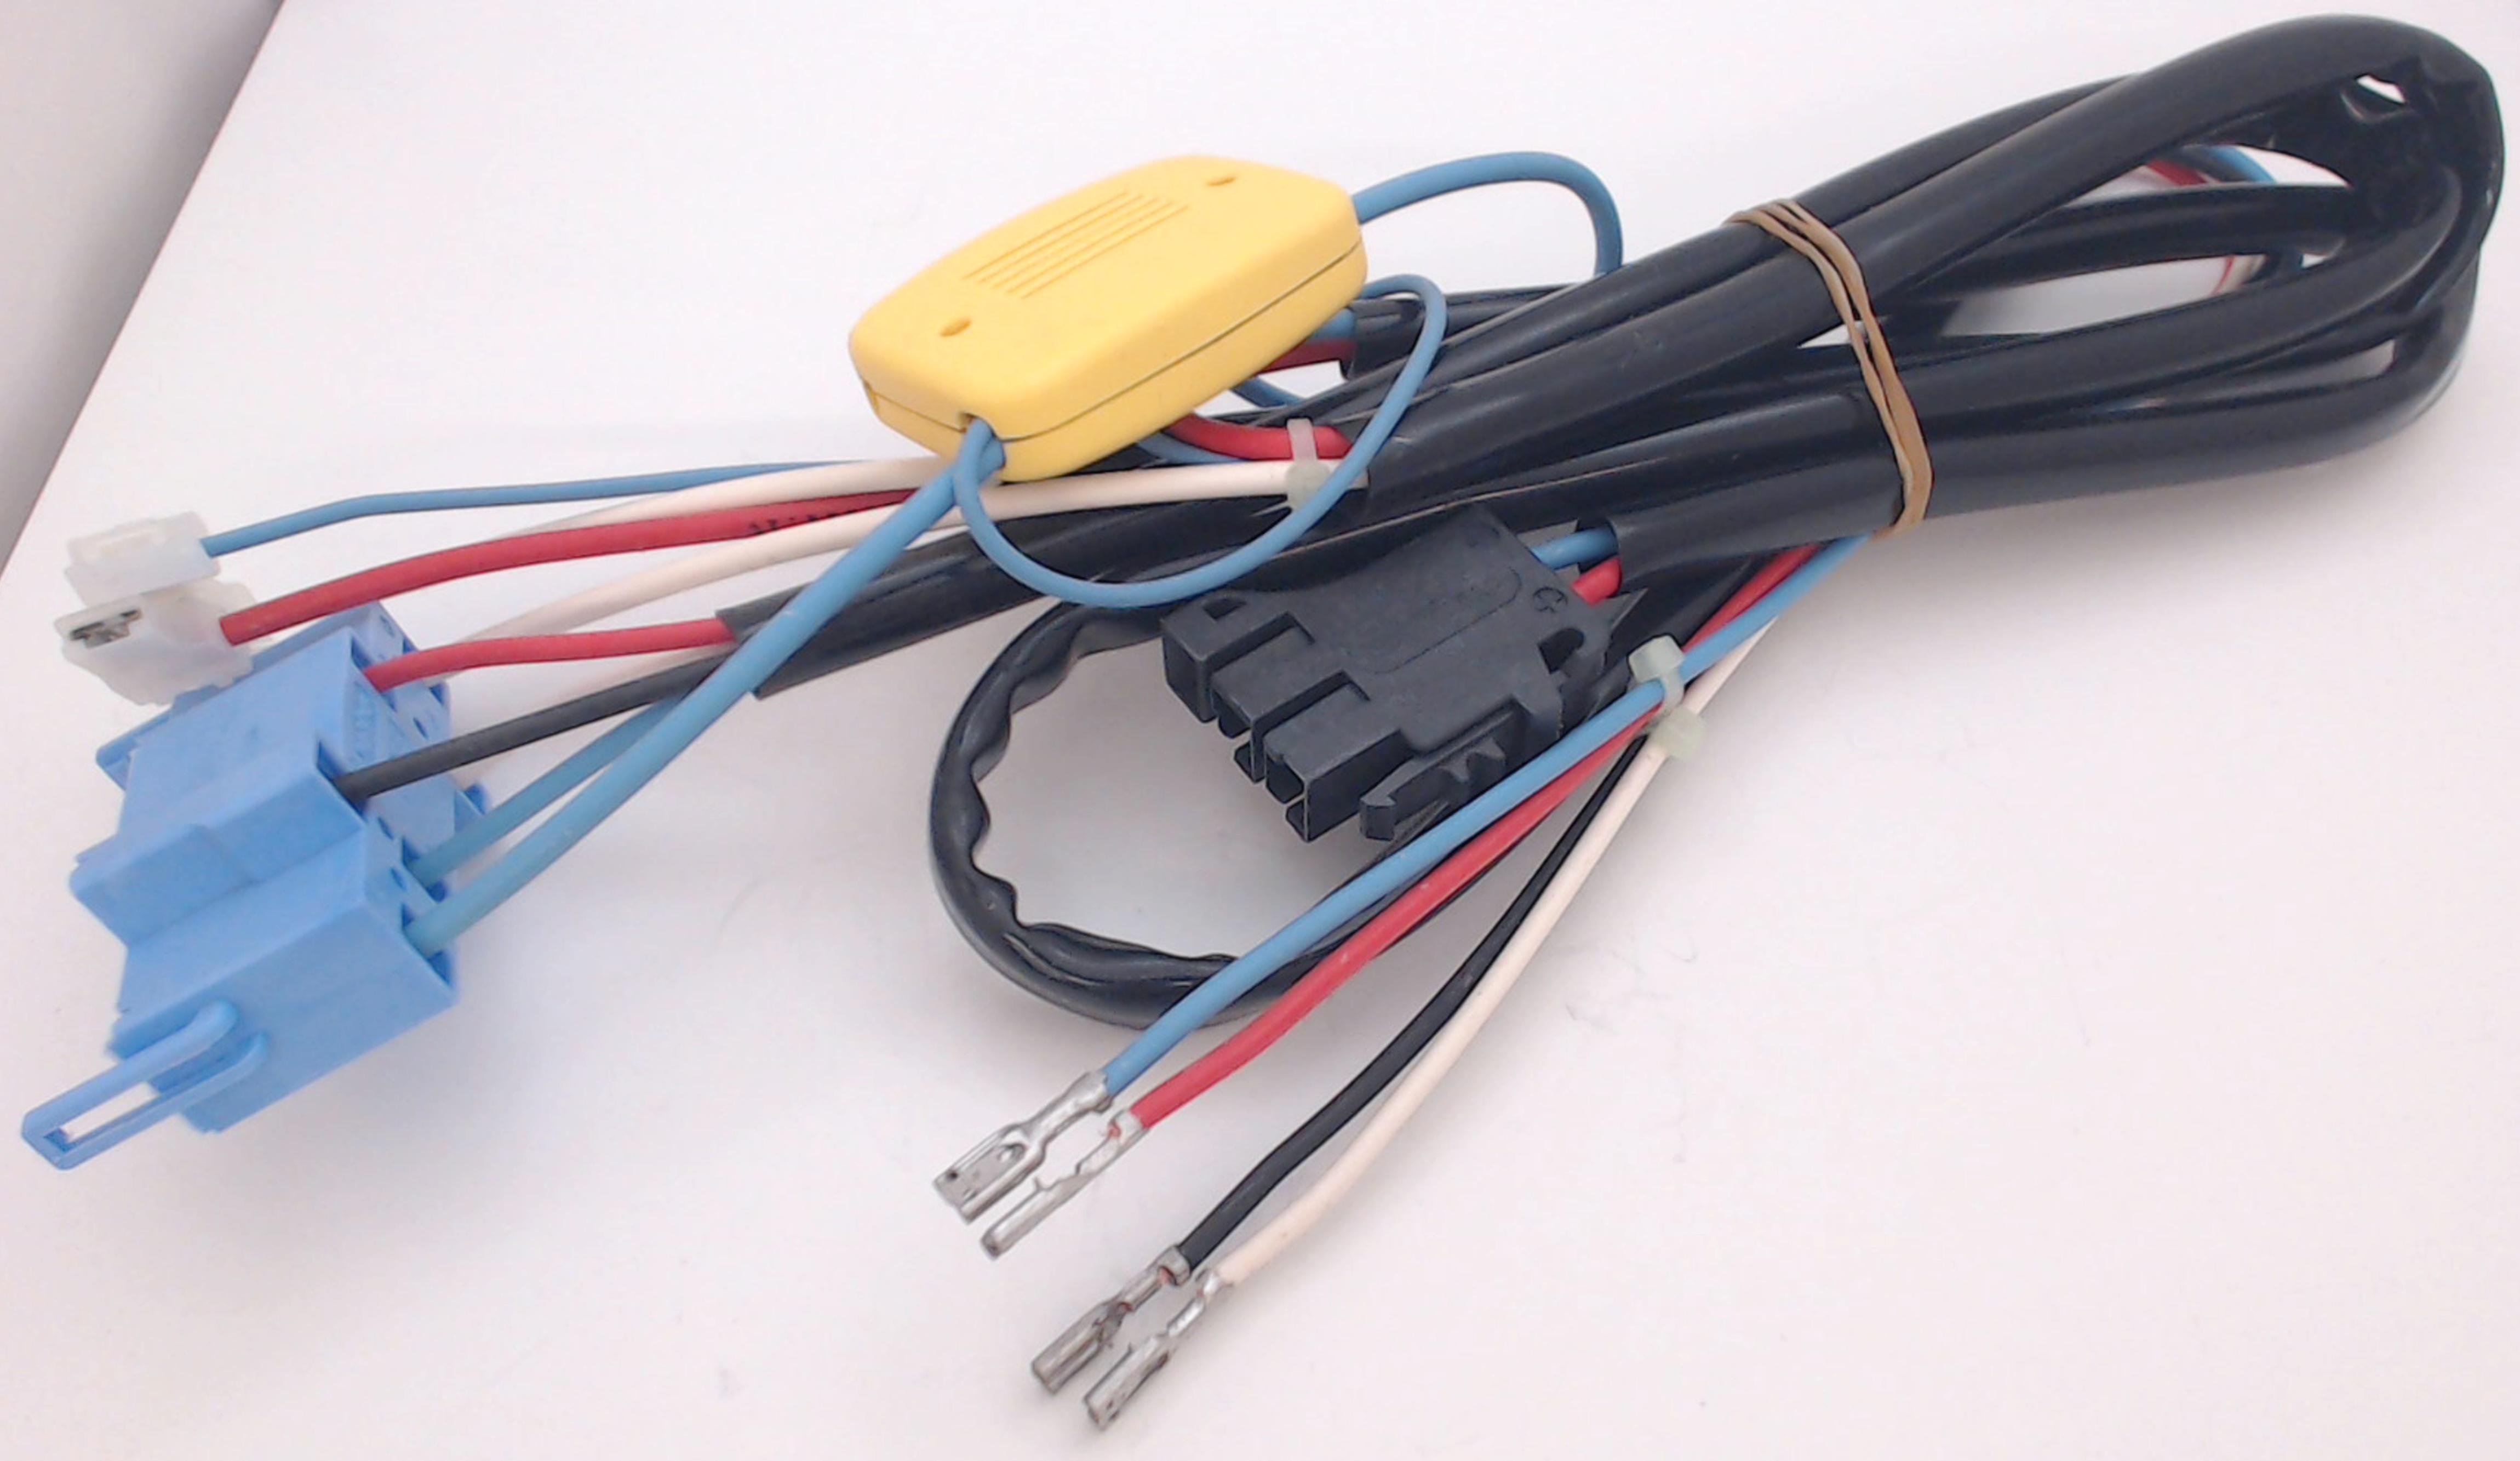 Genuine OEM Peg-Perego Wire Harness for Hlr-Polaris 700, MEIE0474